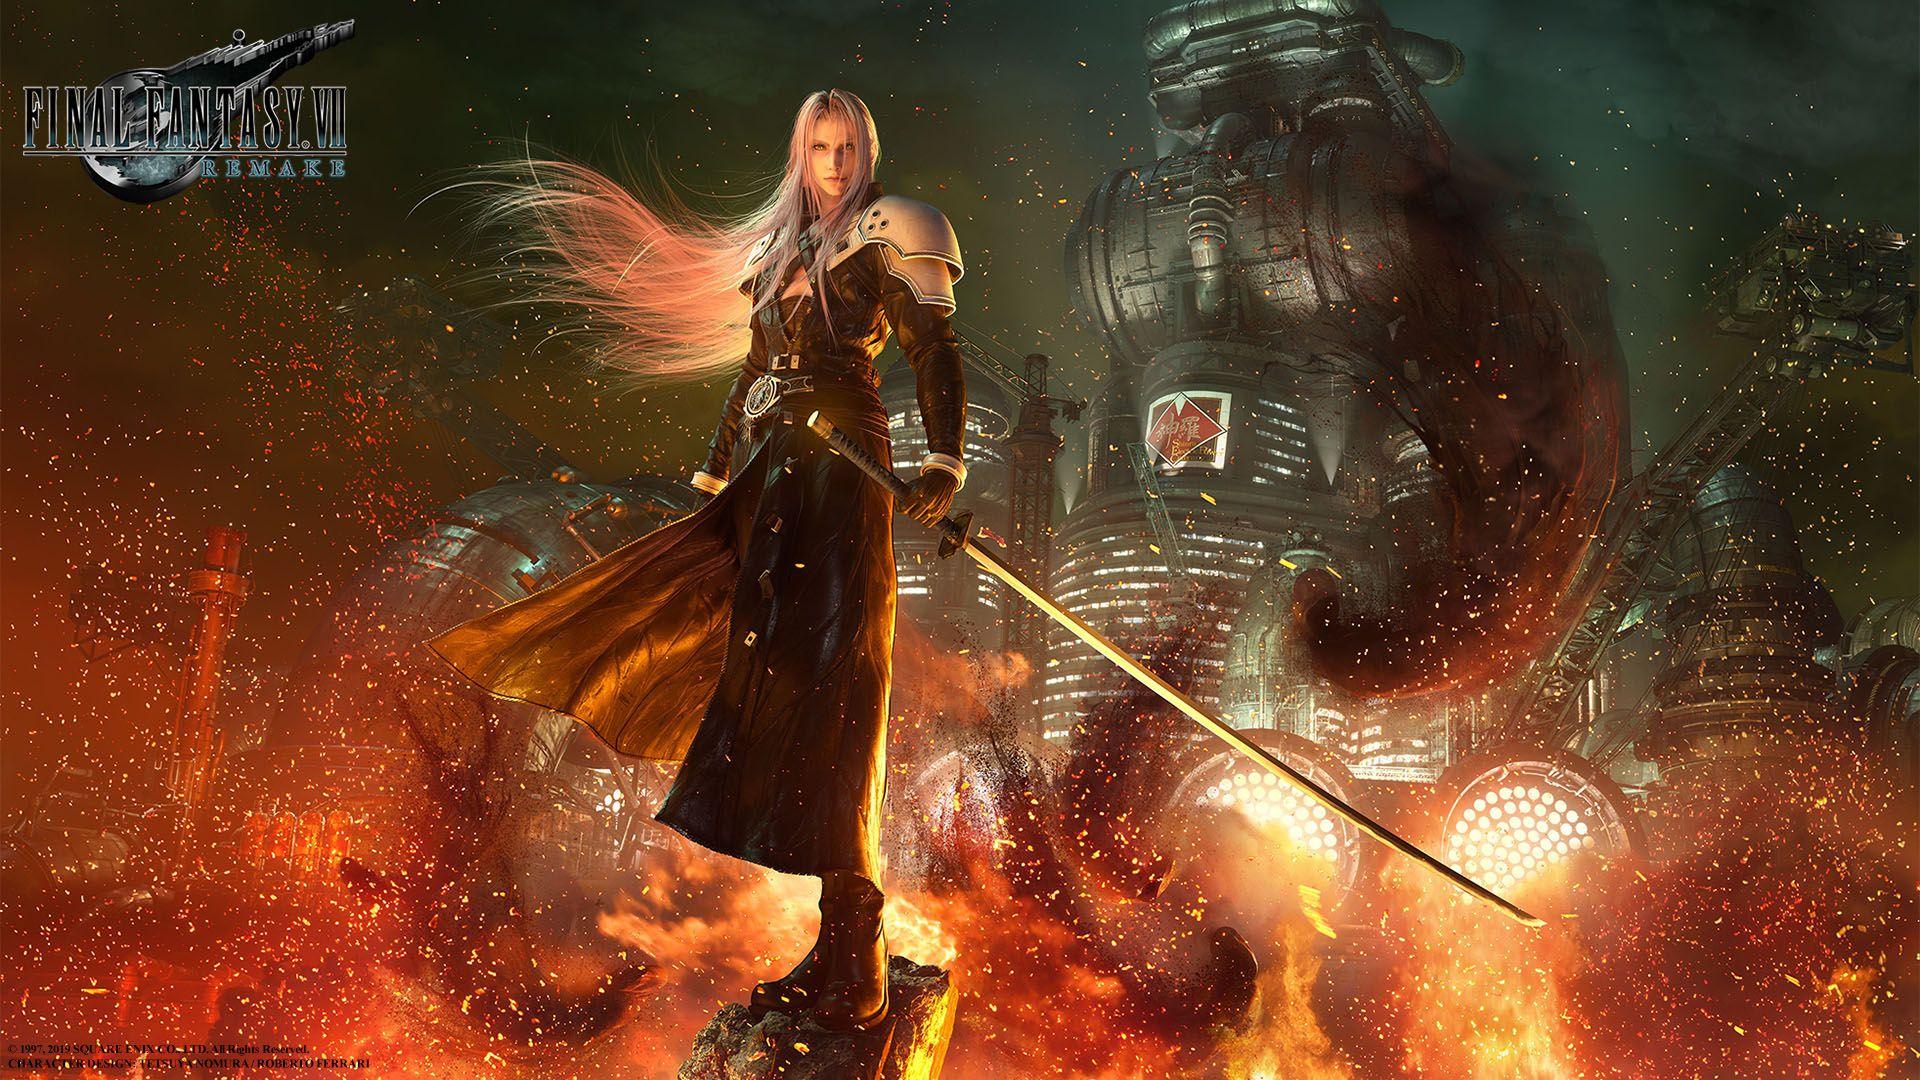 Final Fantasy Vii Neuauflage